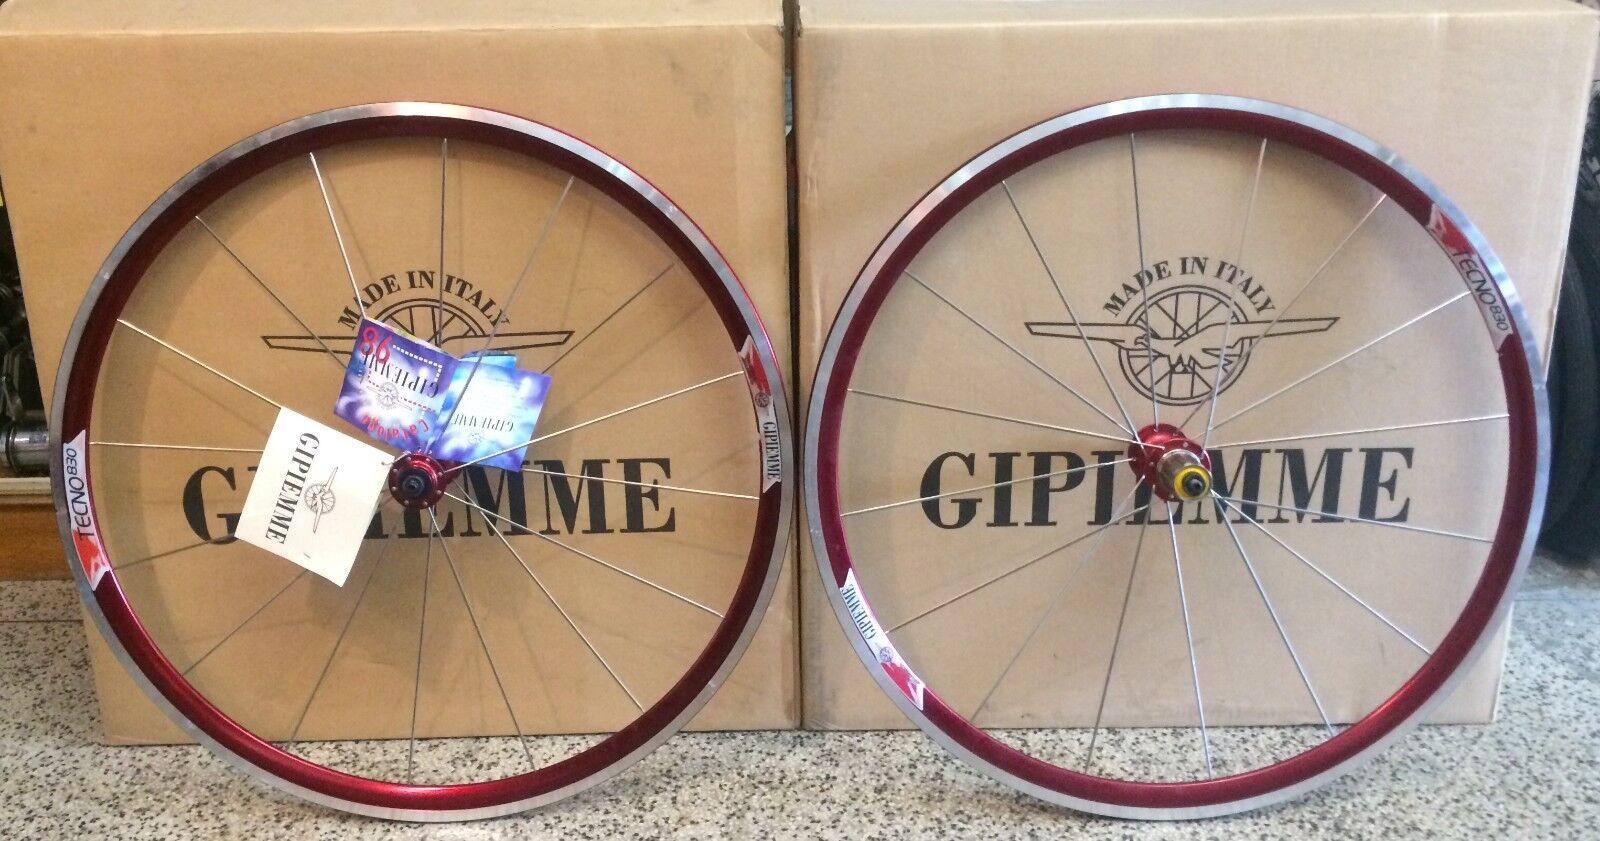 GIPIEMME TECNO 830 WHEELSET  - RED - 700c - 16 holes - NOS NIB  hottest new styles